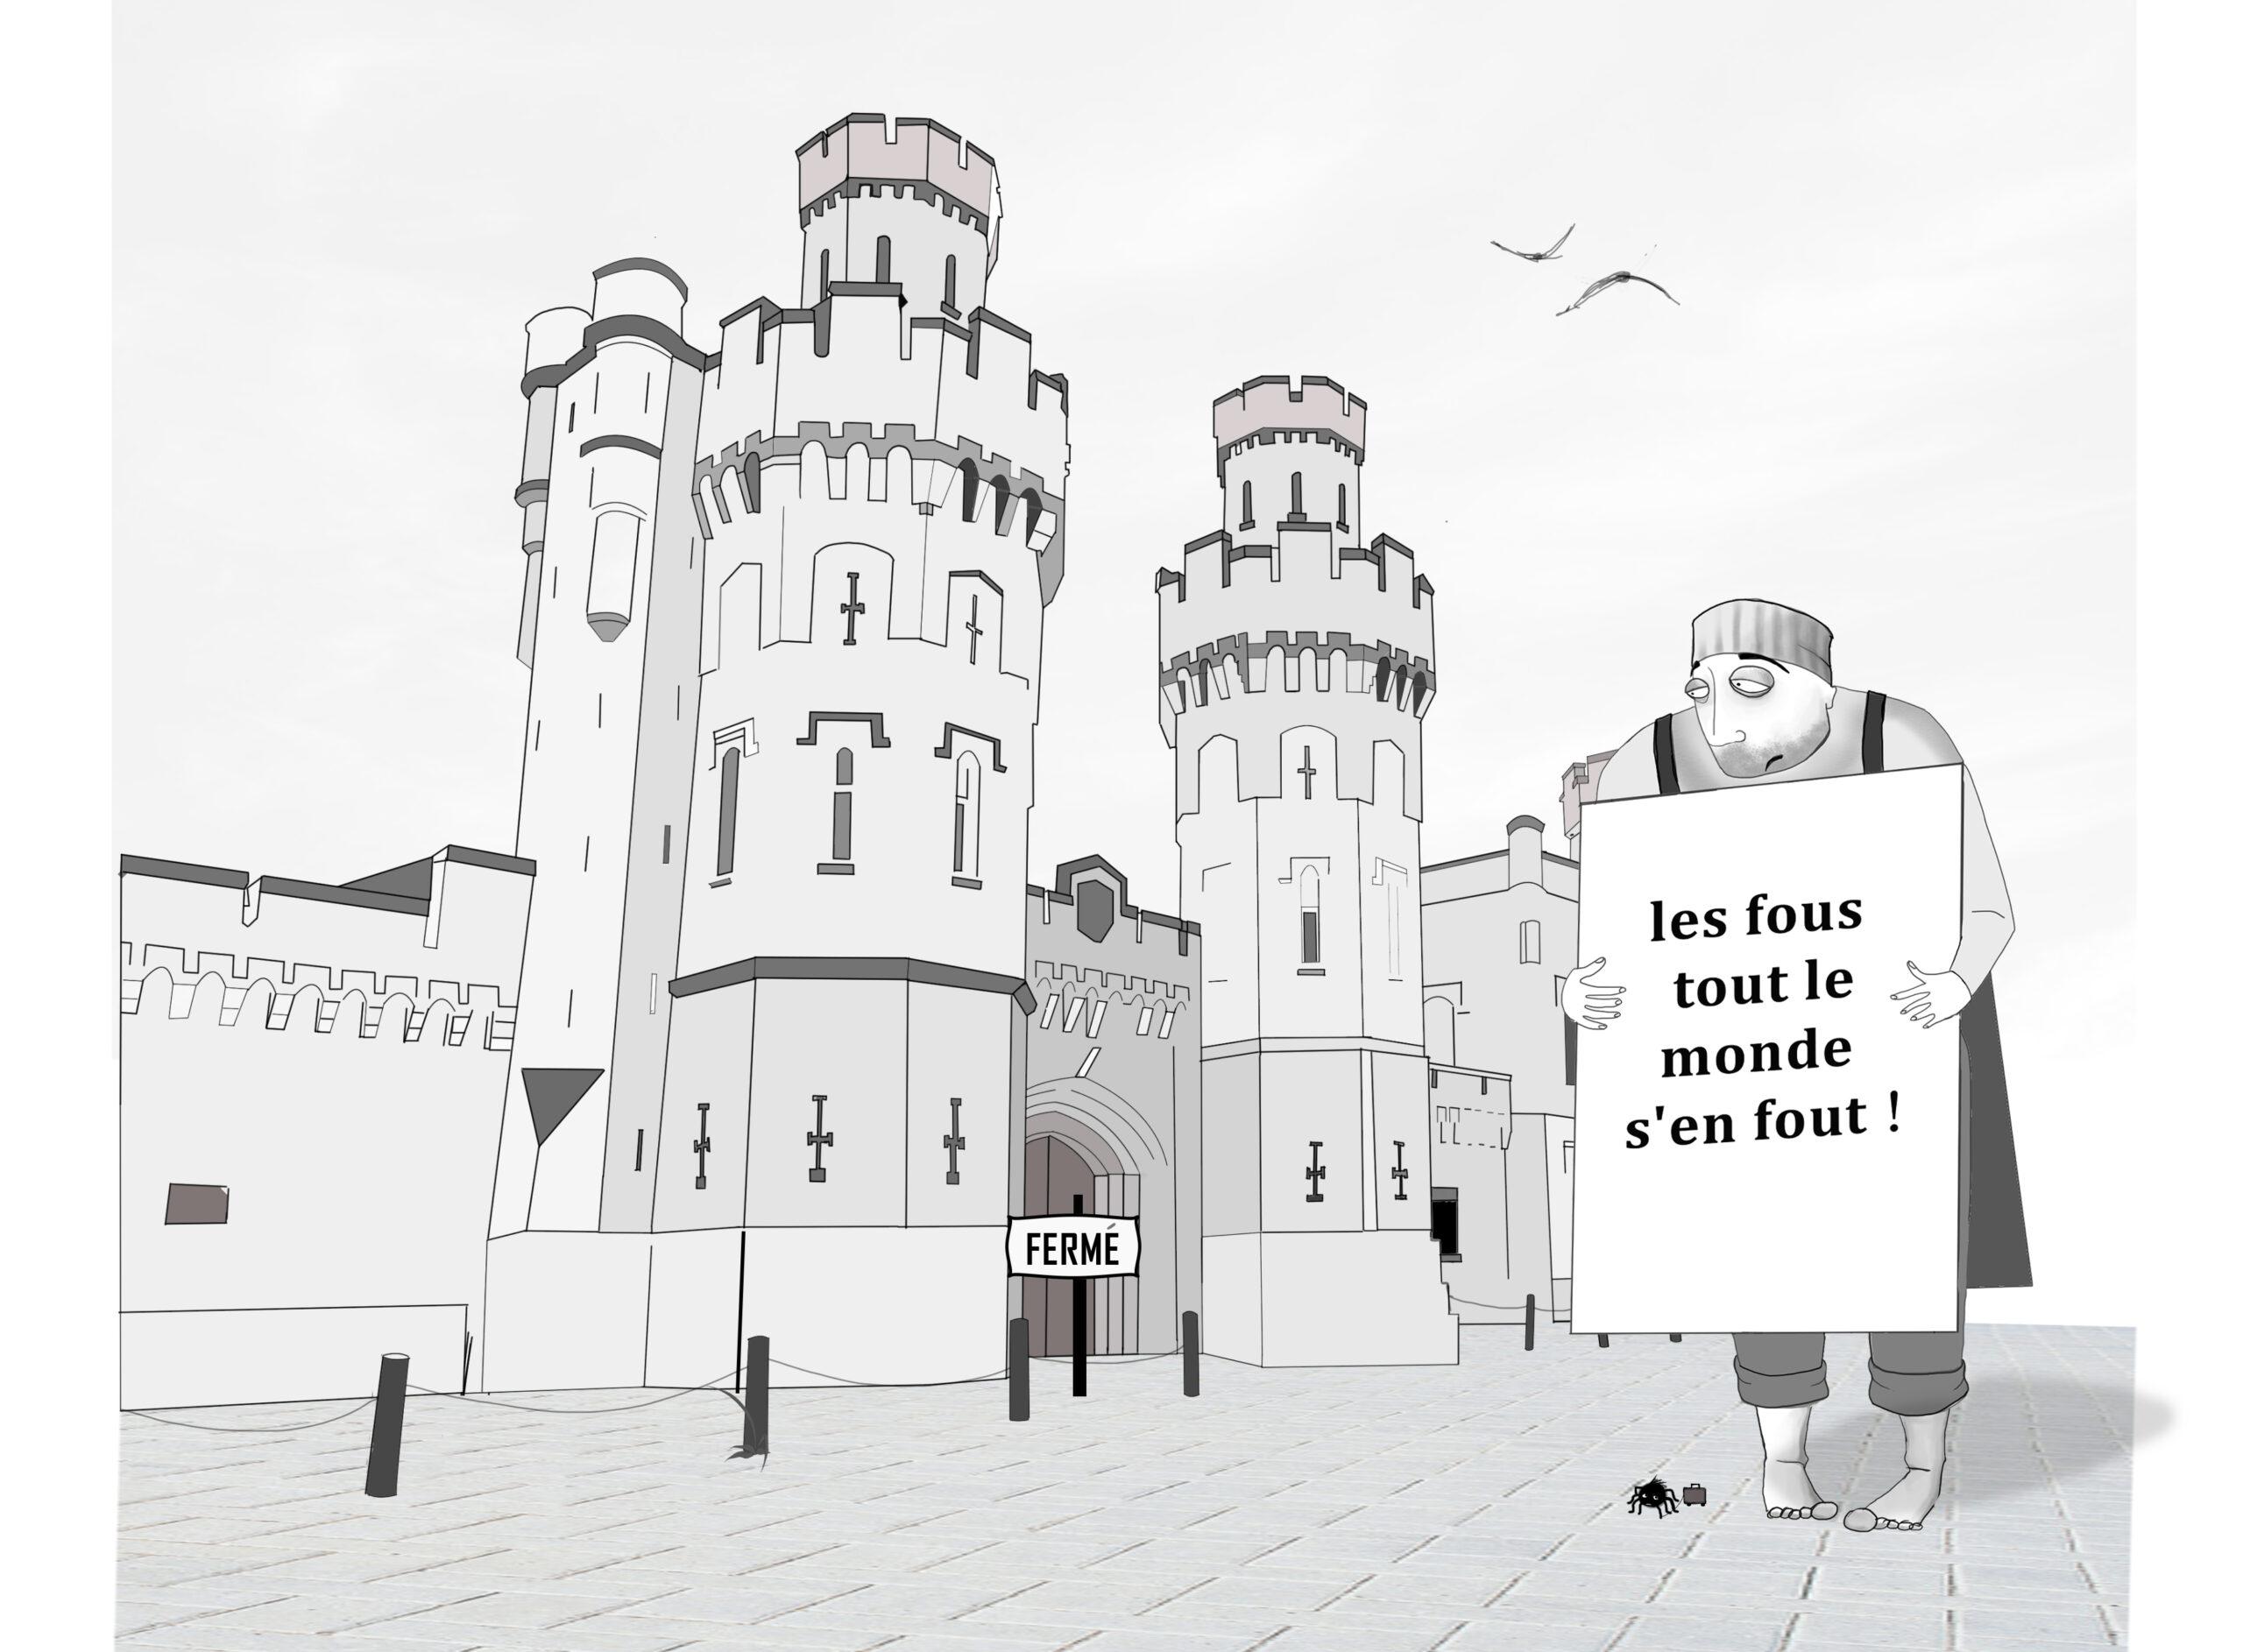 prison_article_10.jpg